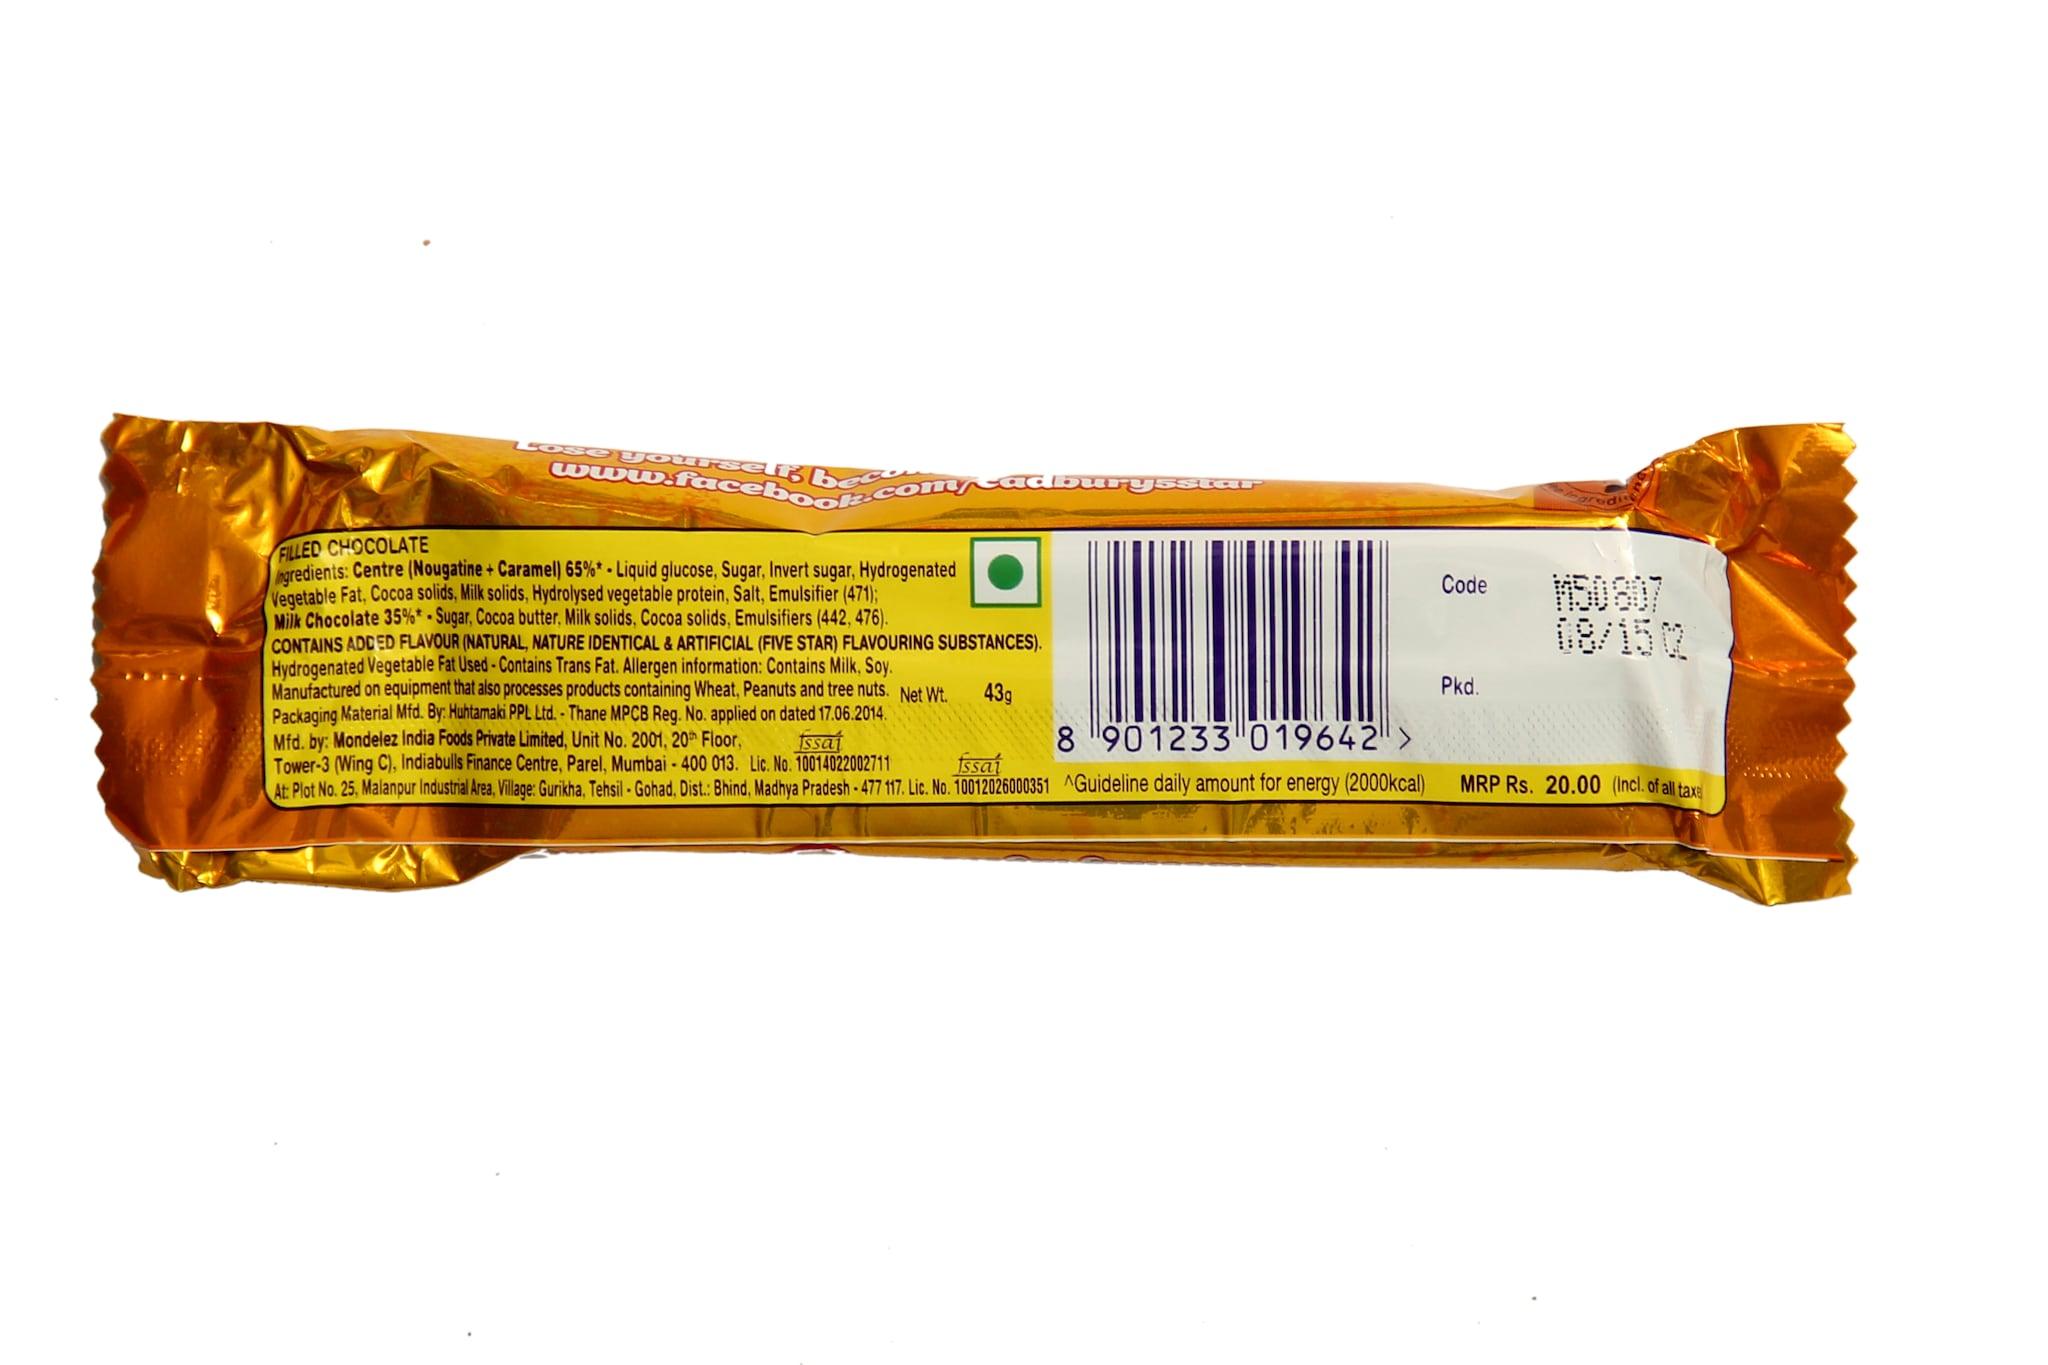 Cadbury 5 Star Chocolate